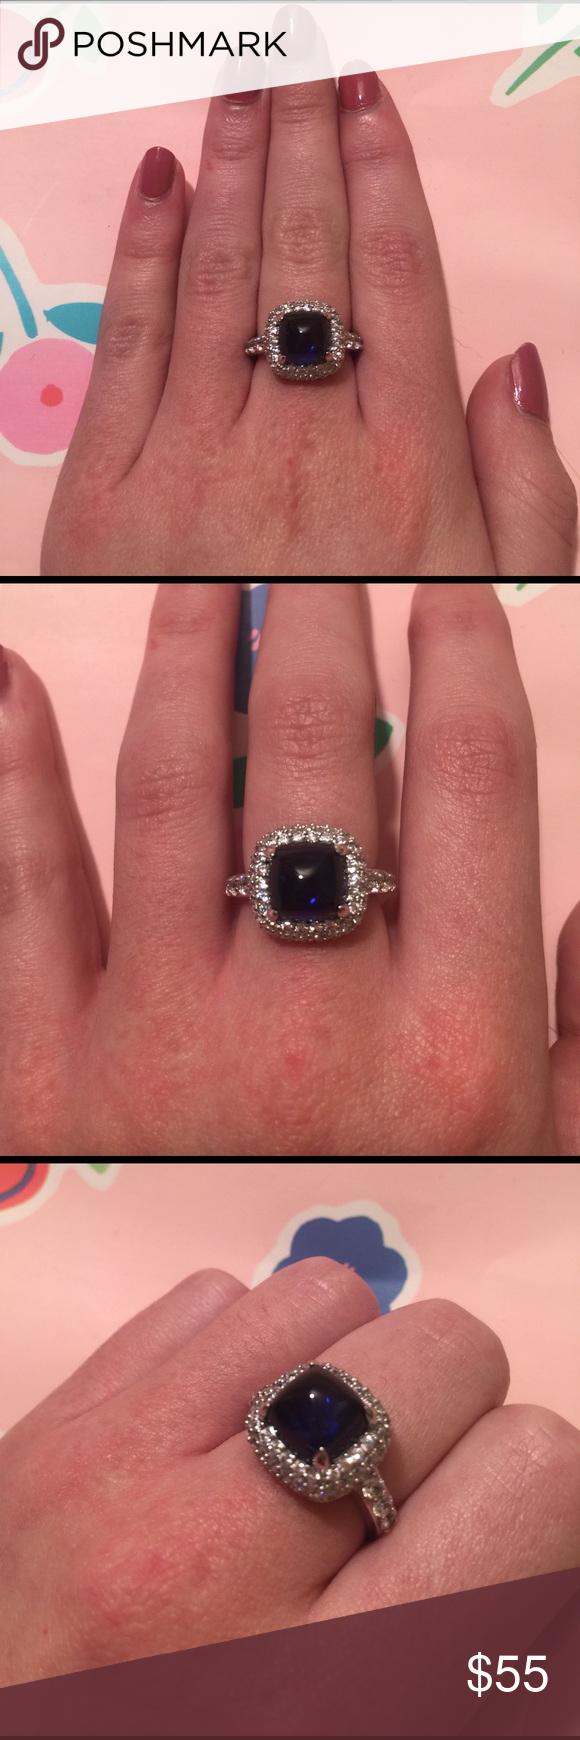 Princess Diana Ring | My Posh Picks | Pinterest | Princess diana ...